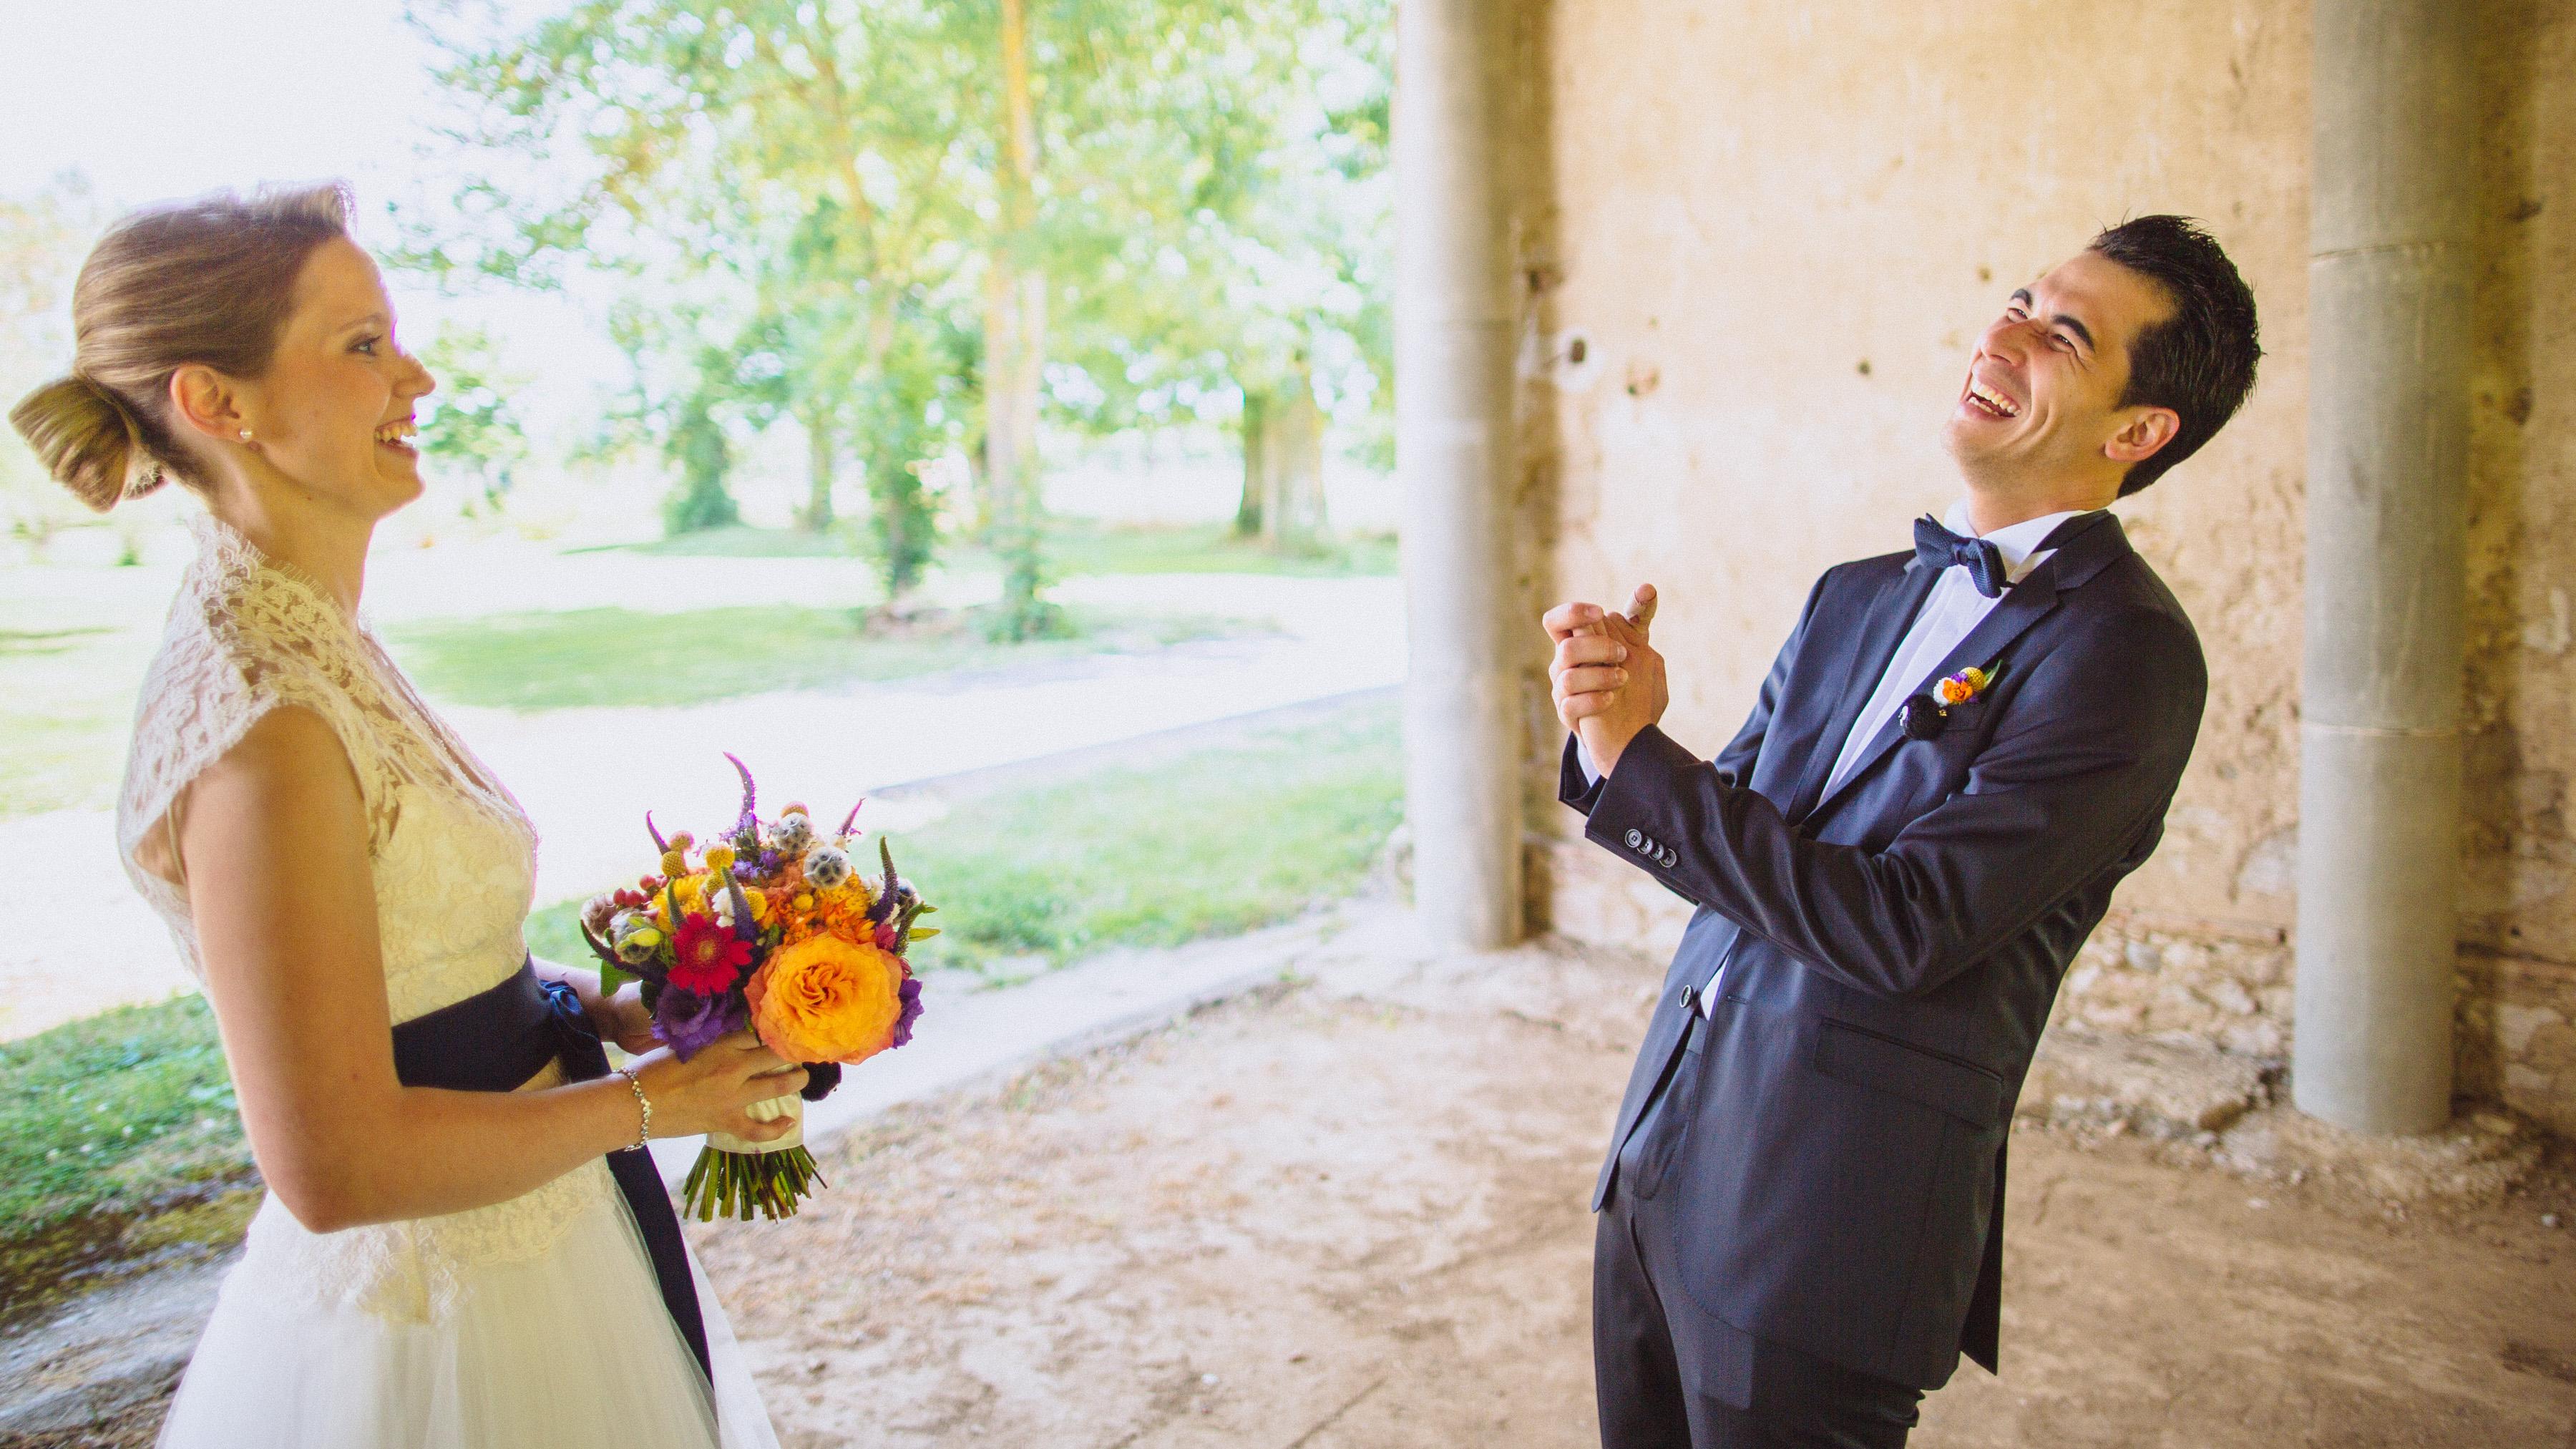 camille_nico___mariage_____ricardo_vieira_photographe_Ma-Vie-de-Boheme_70